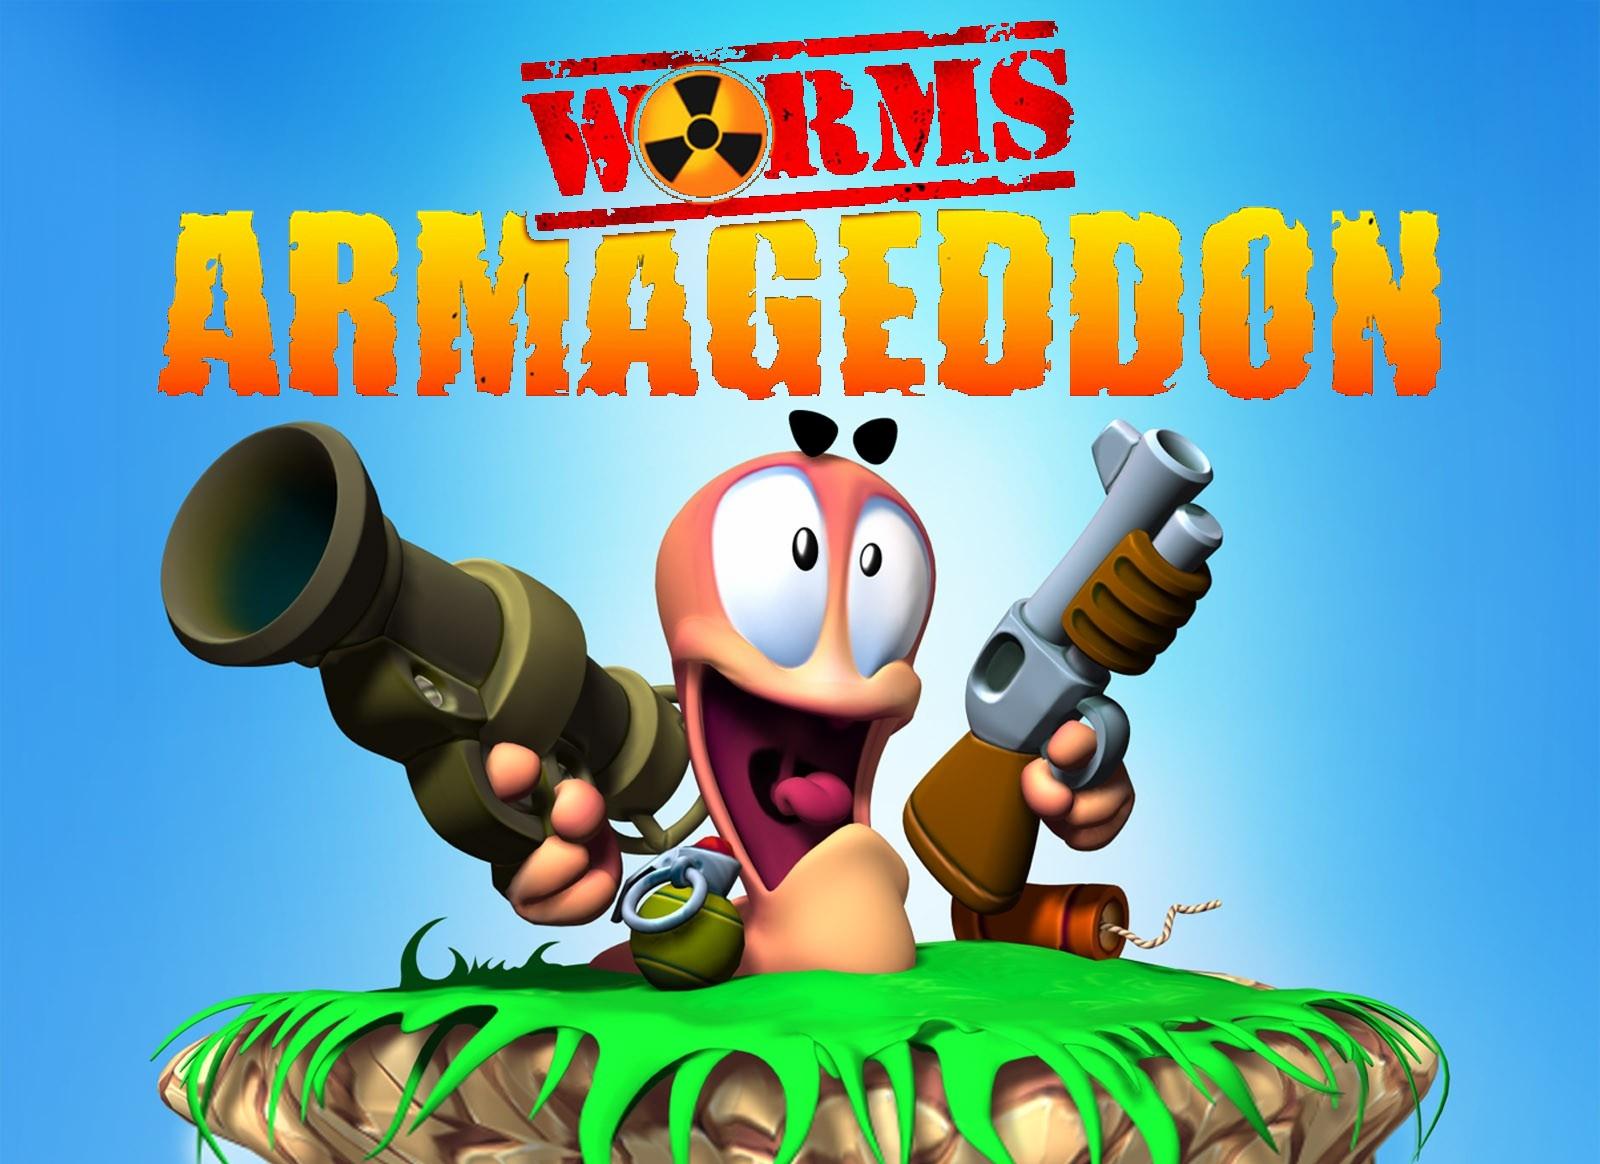 Worms Armageddon Download Poster